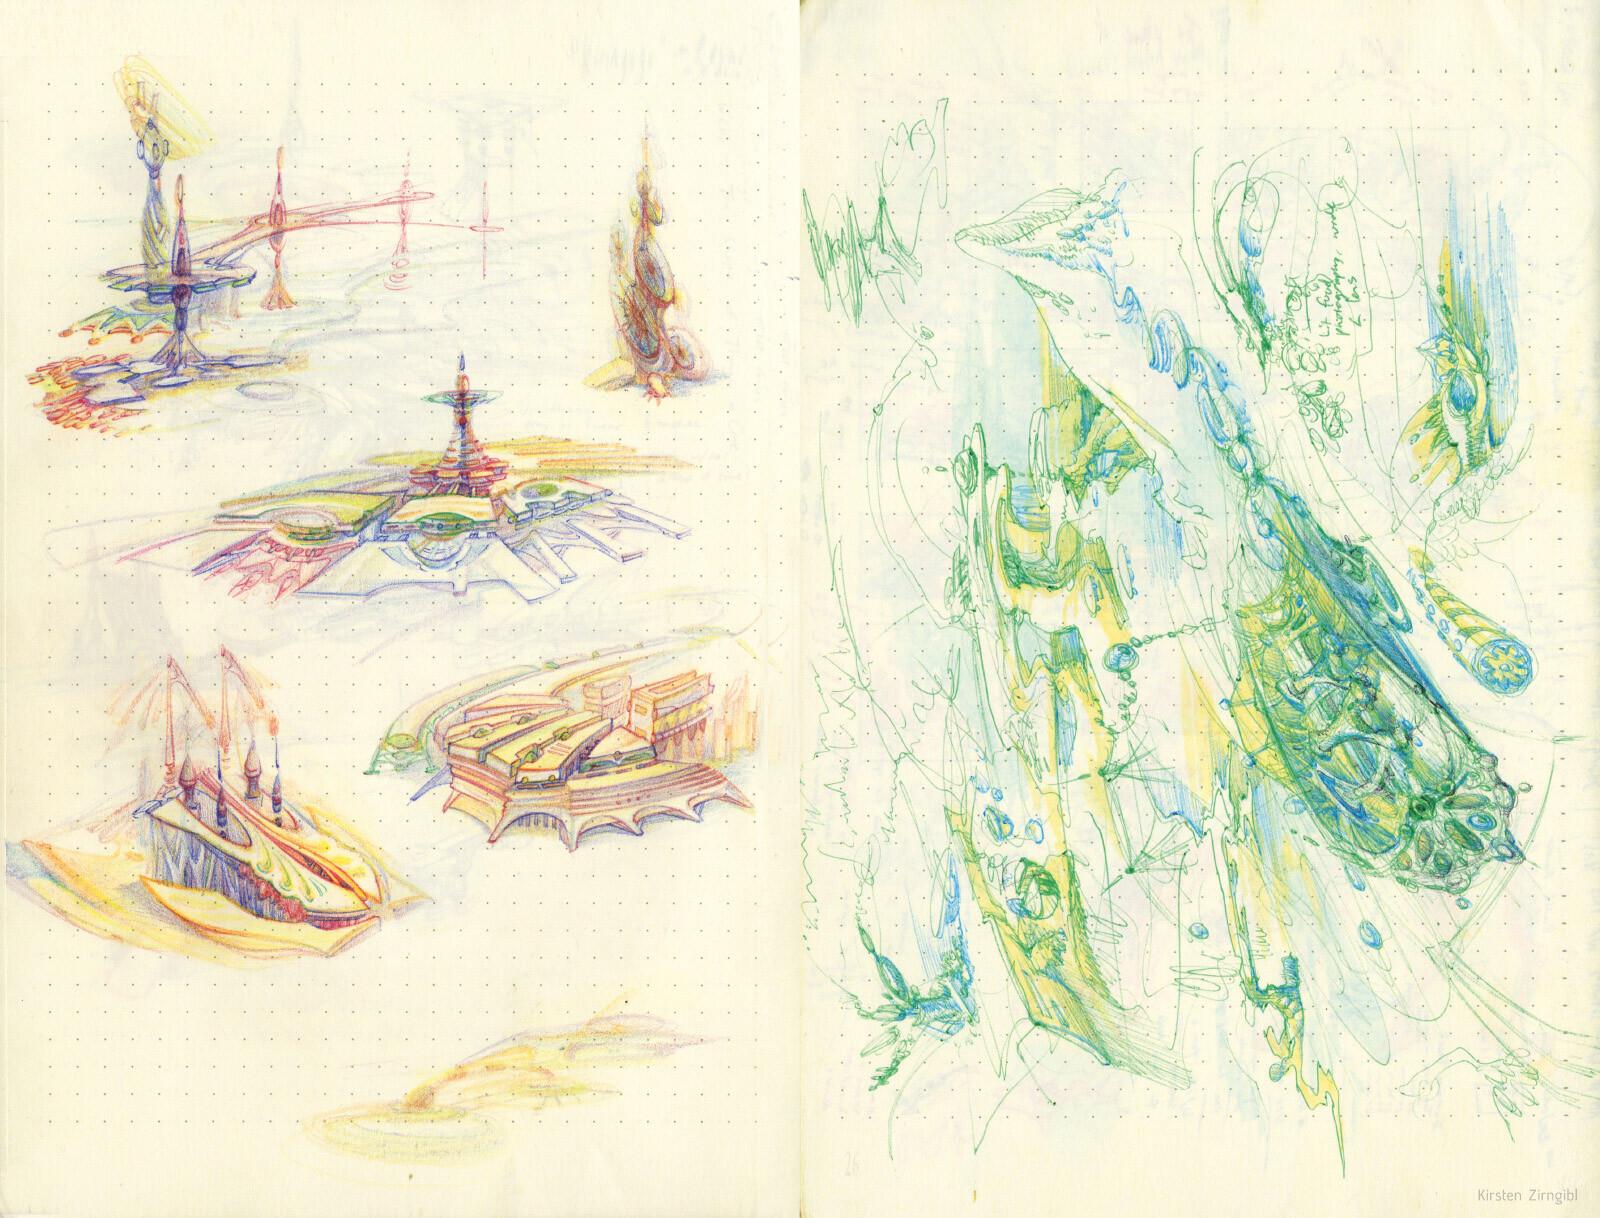 Brainstorming Sketchbook Collection (Part 2)